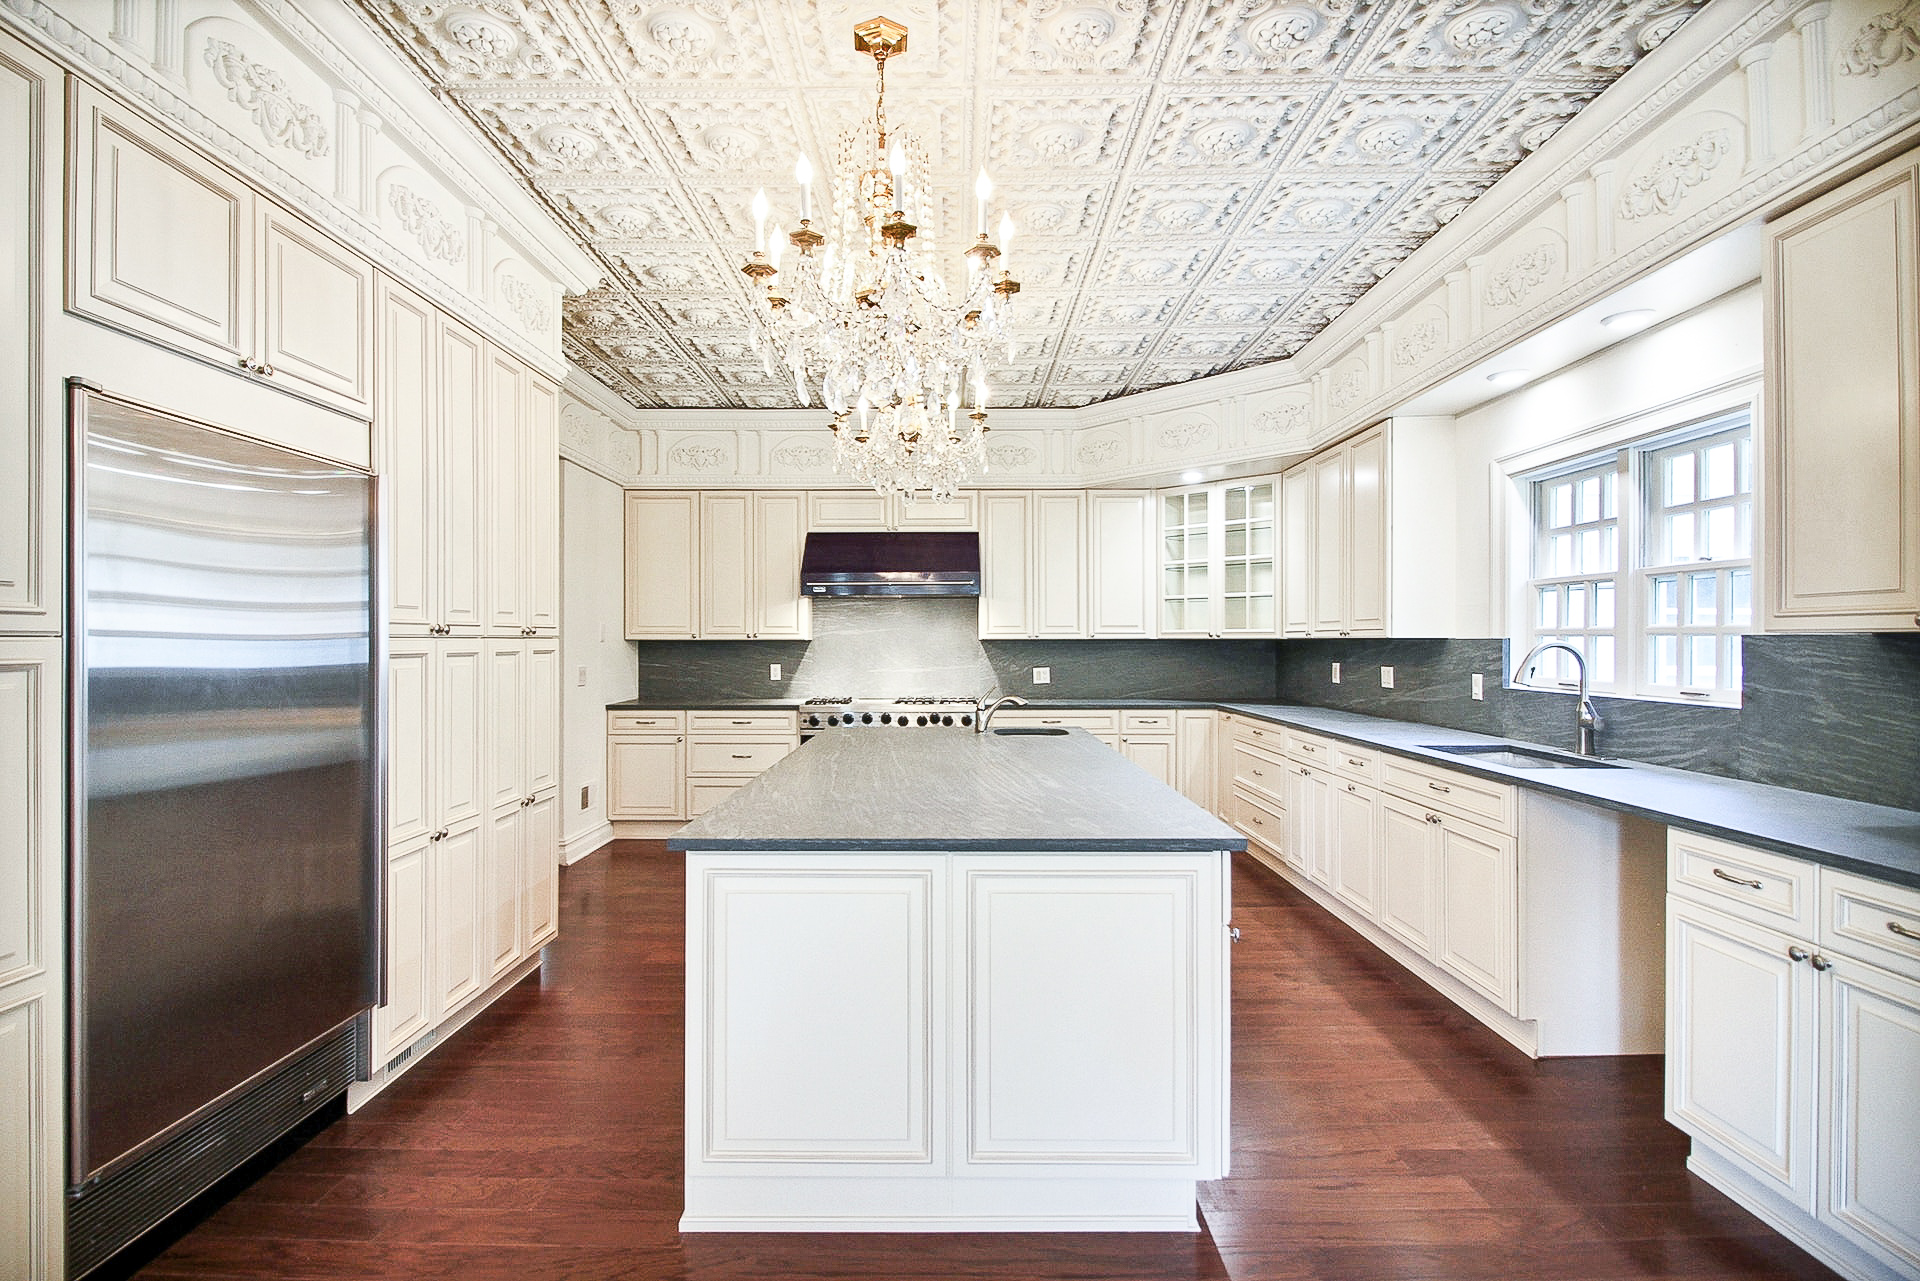 325 South Orange Avenue - Kitchen